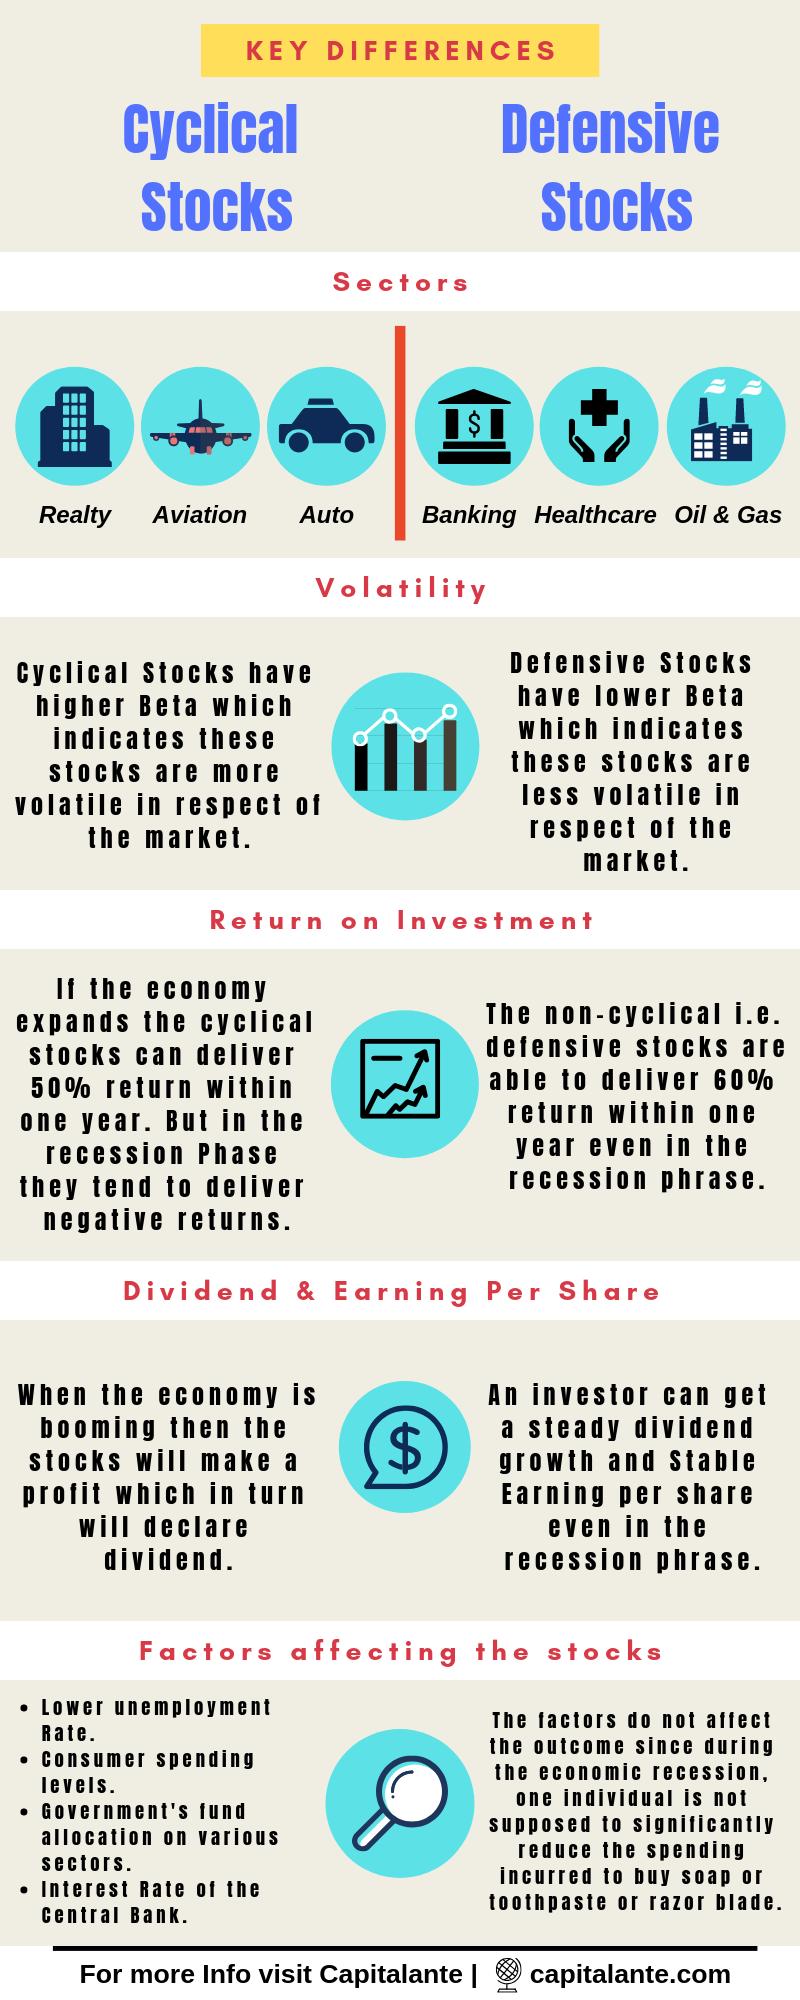 Cyclical stocks Vs Defensive stocks